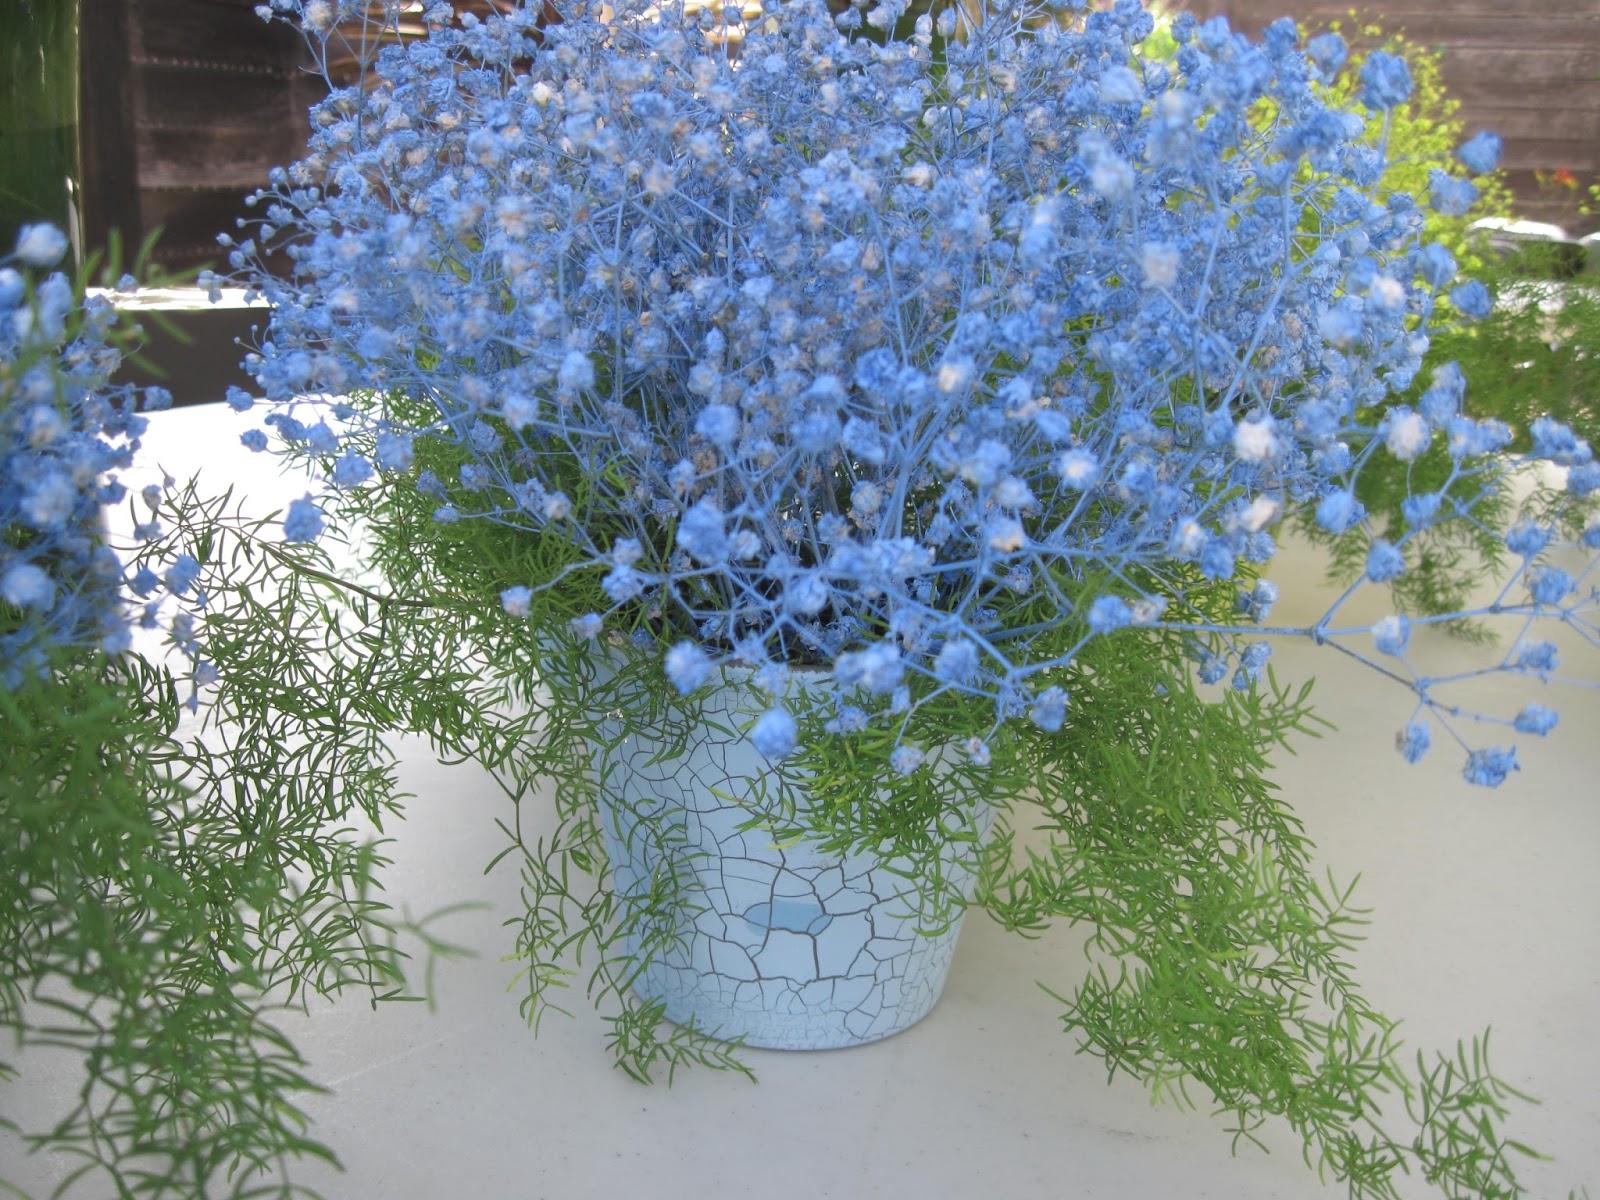 Blue flowers for floral arrangements desktop wallpaper